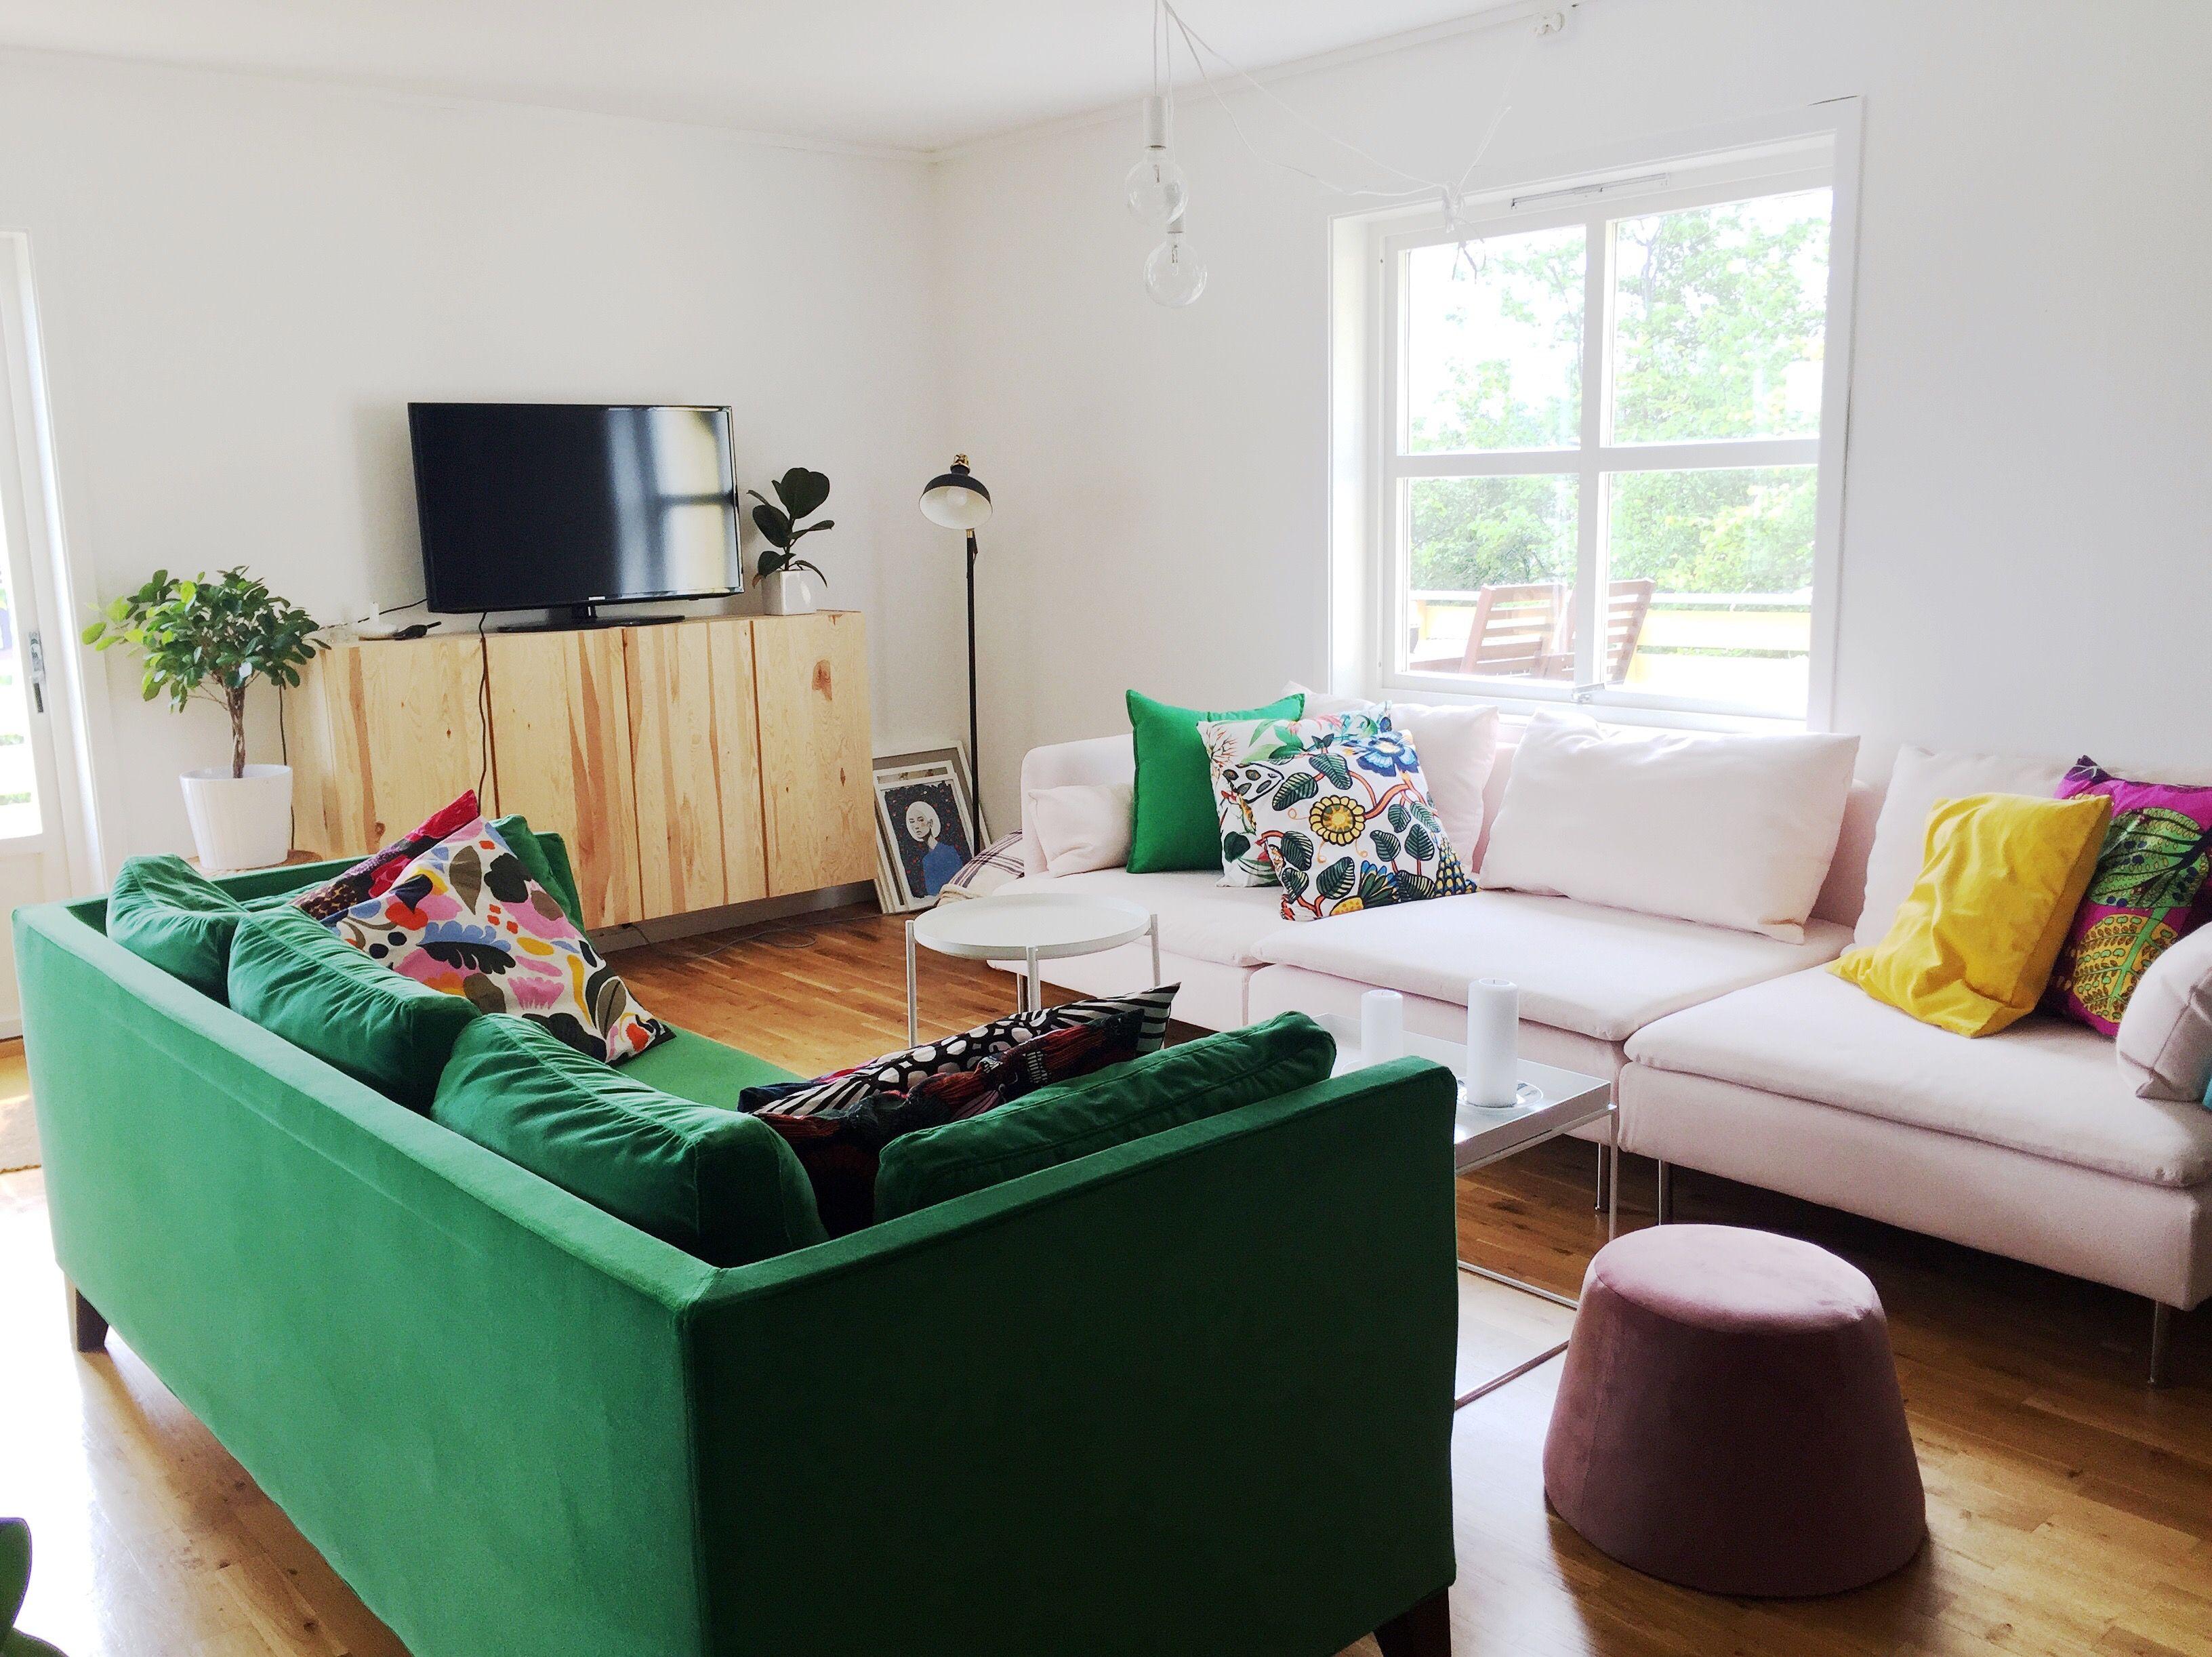 Home Living room green IKEA Stockholm sofa pink IKEA Söderhamn